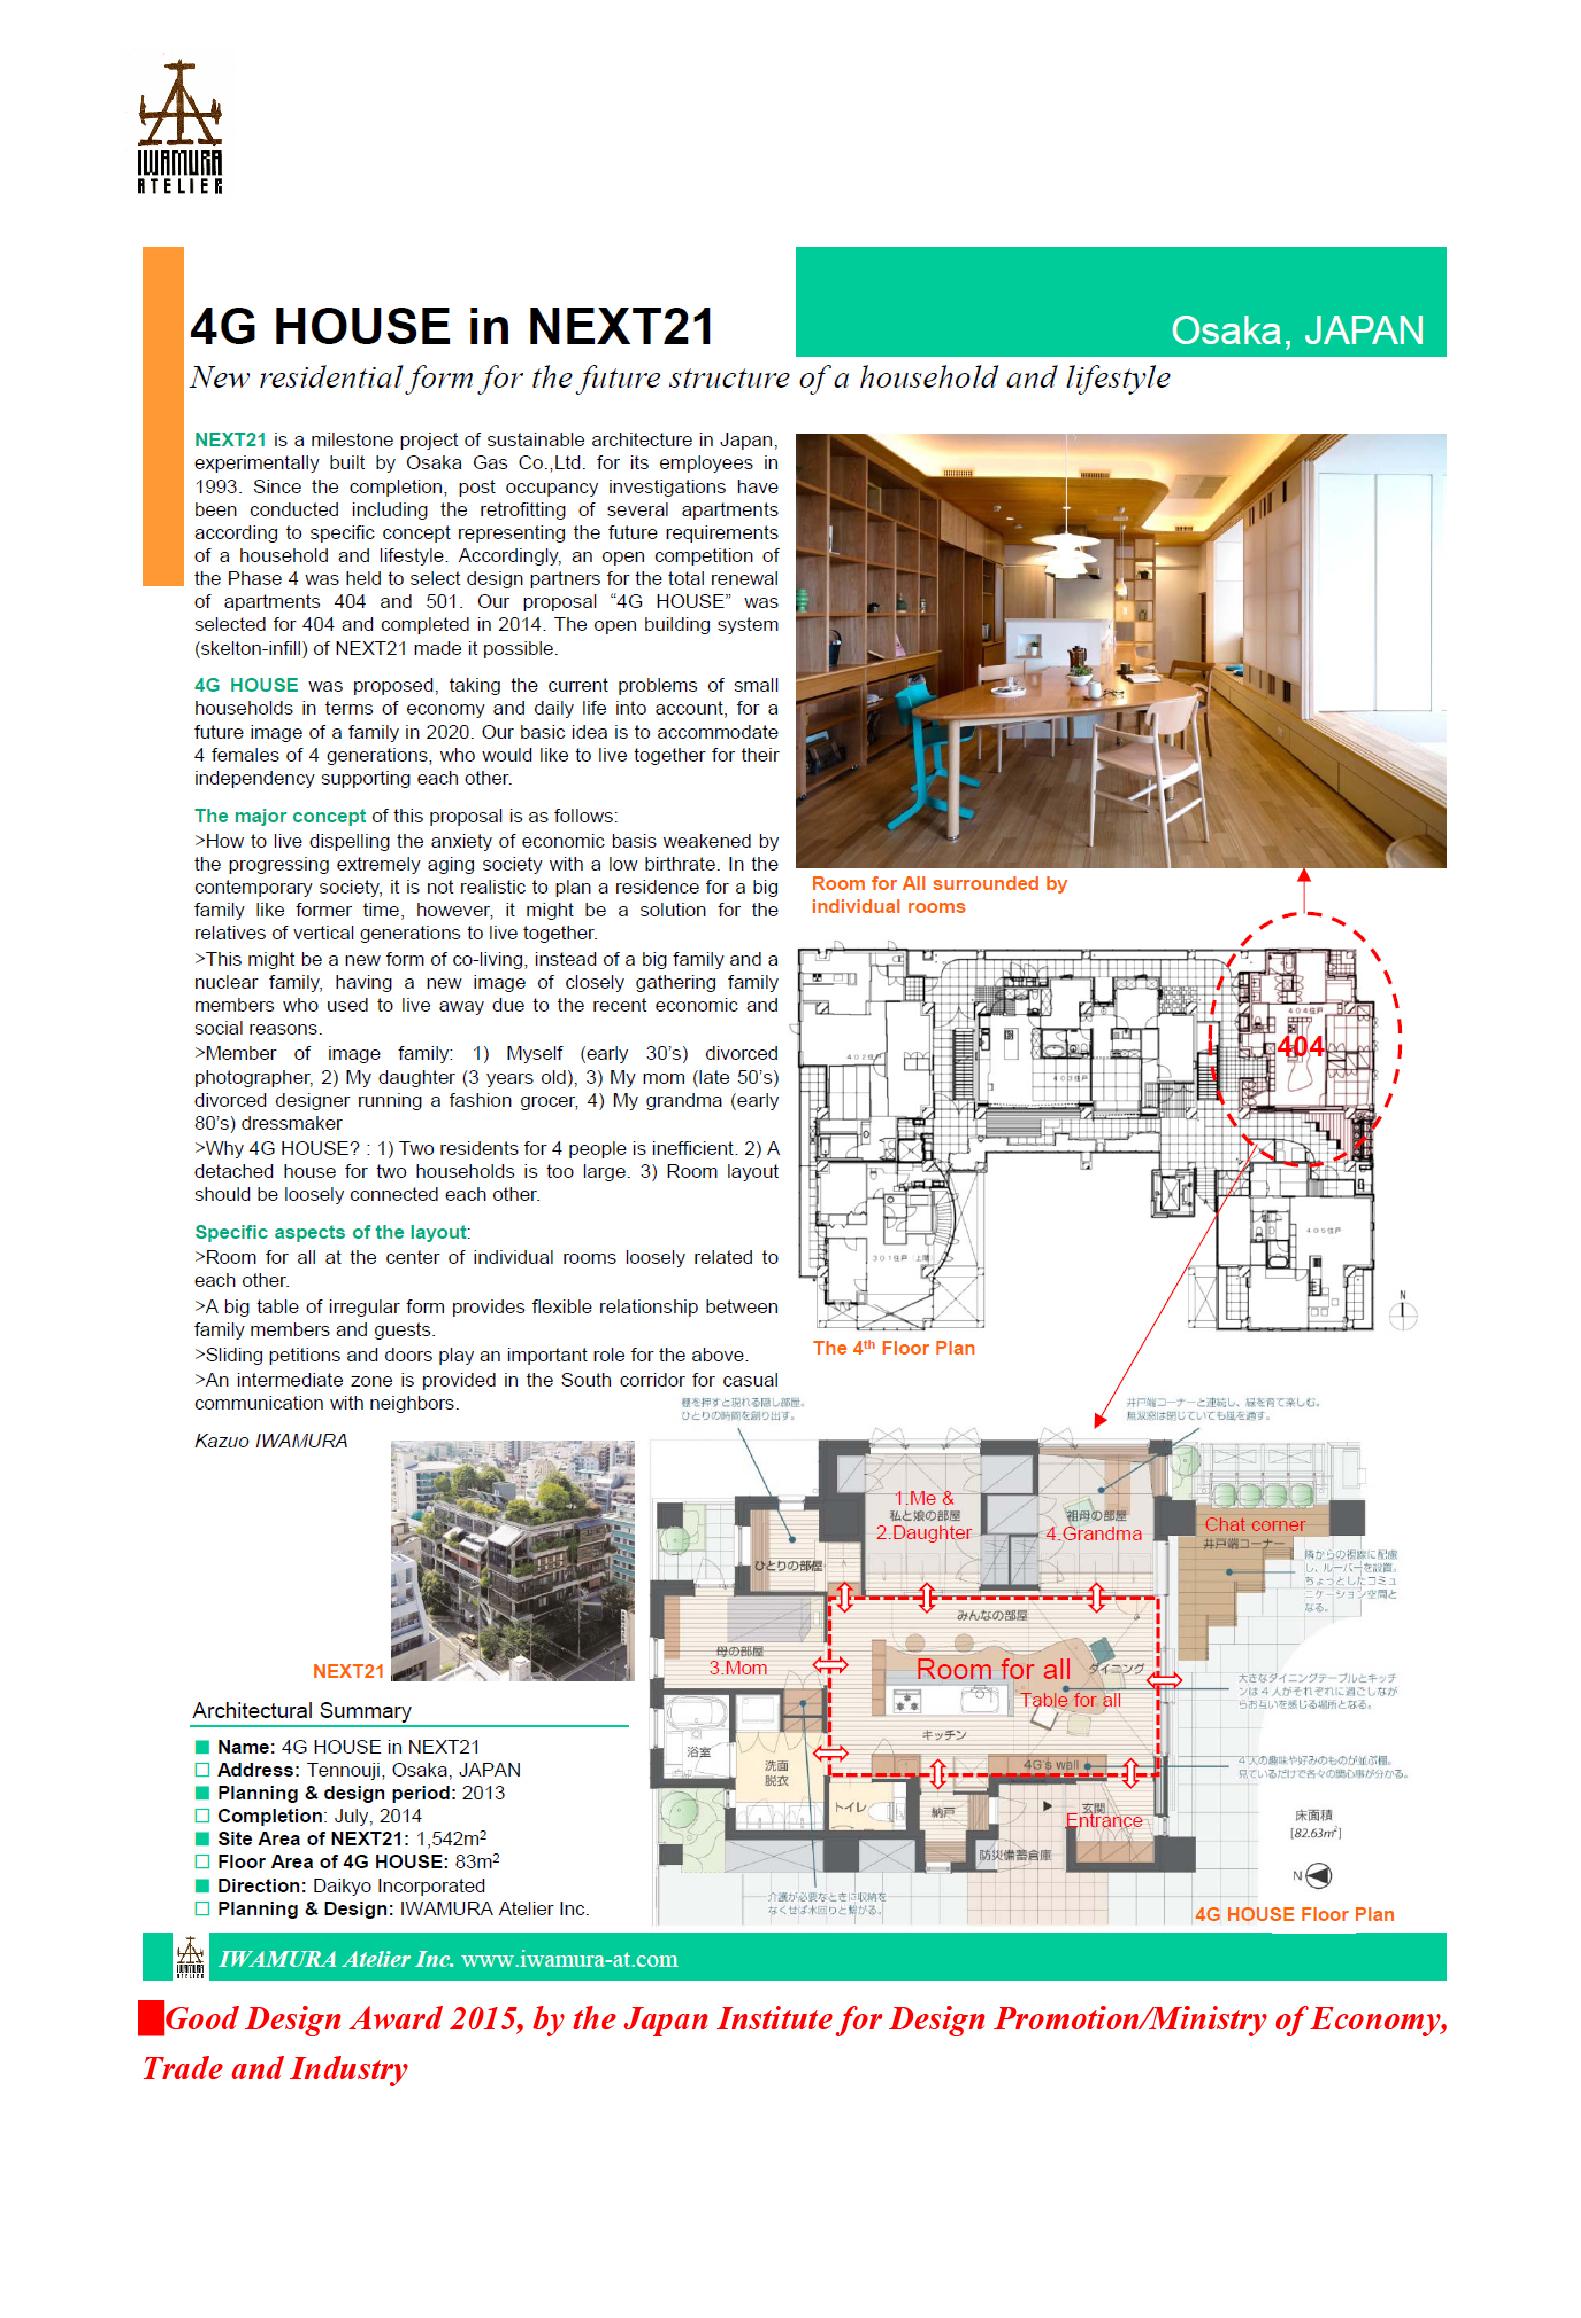 Housing – Iwamura Atelier Inc